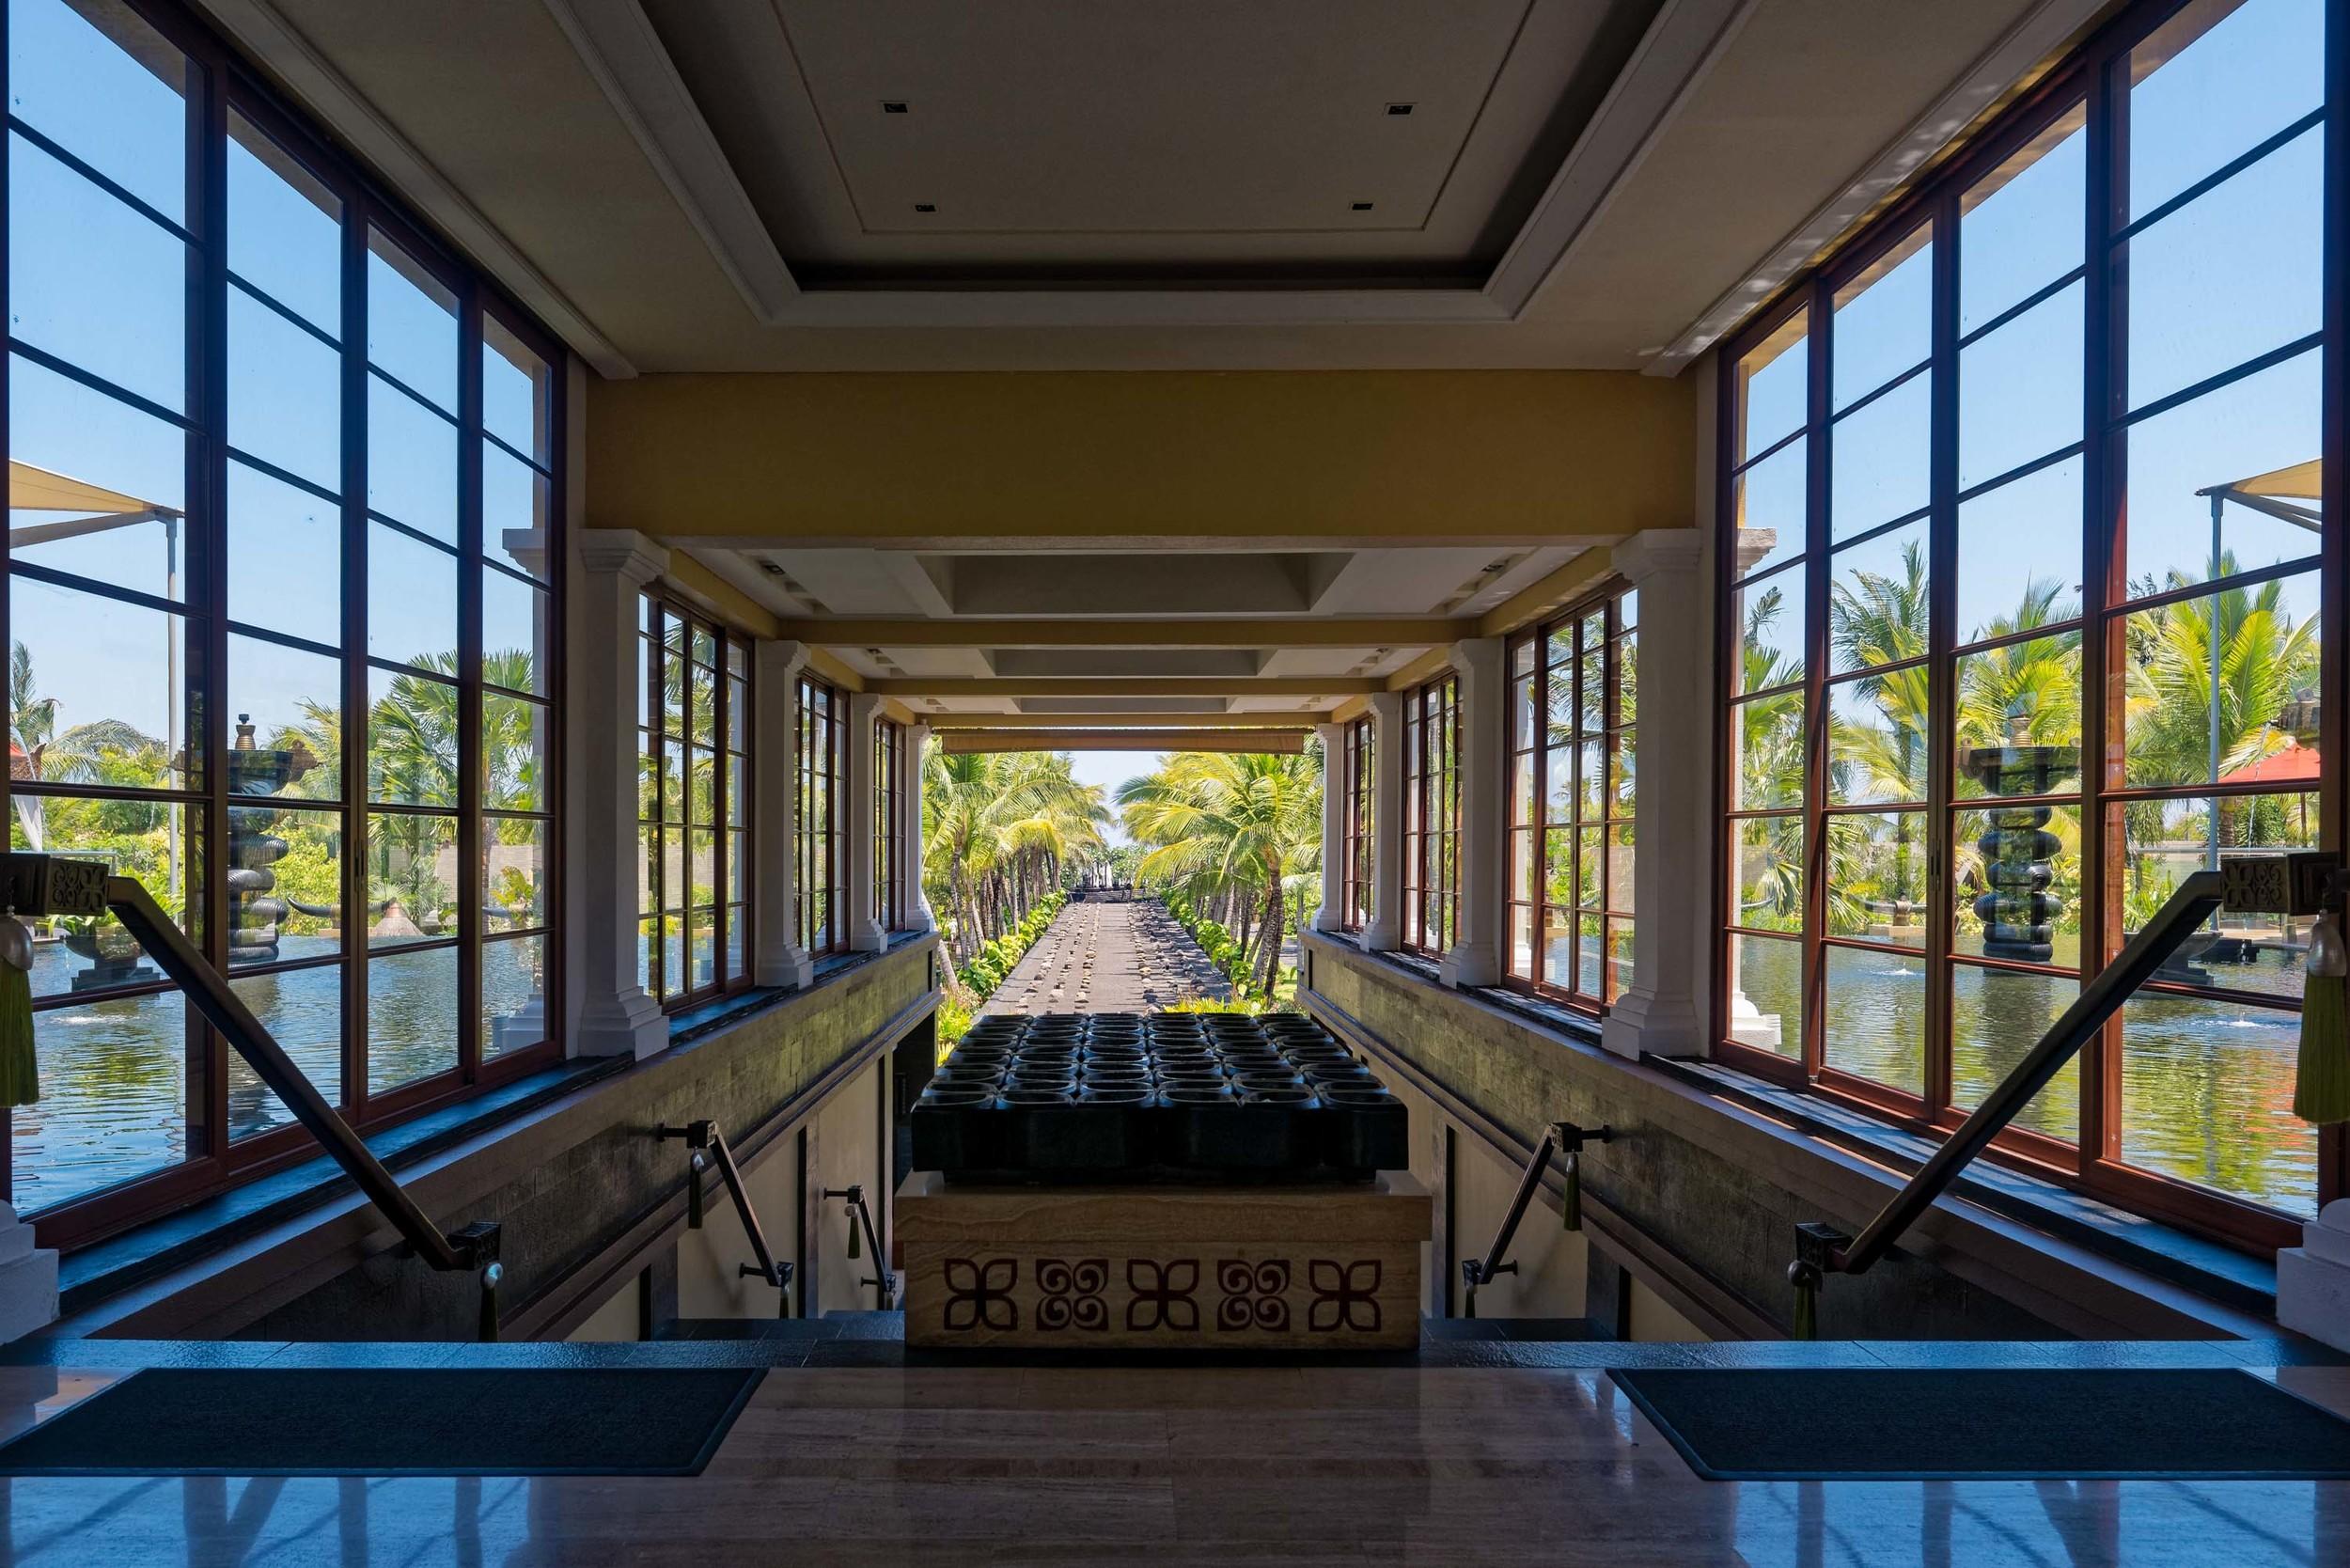 Grand Staircase  The St. Regis Bali Resort